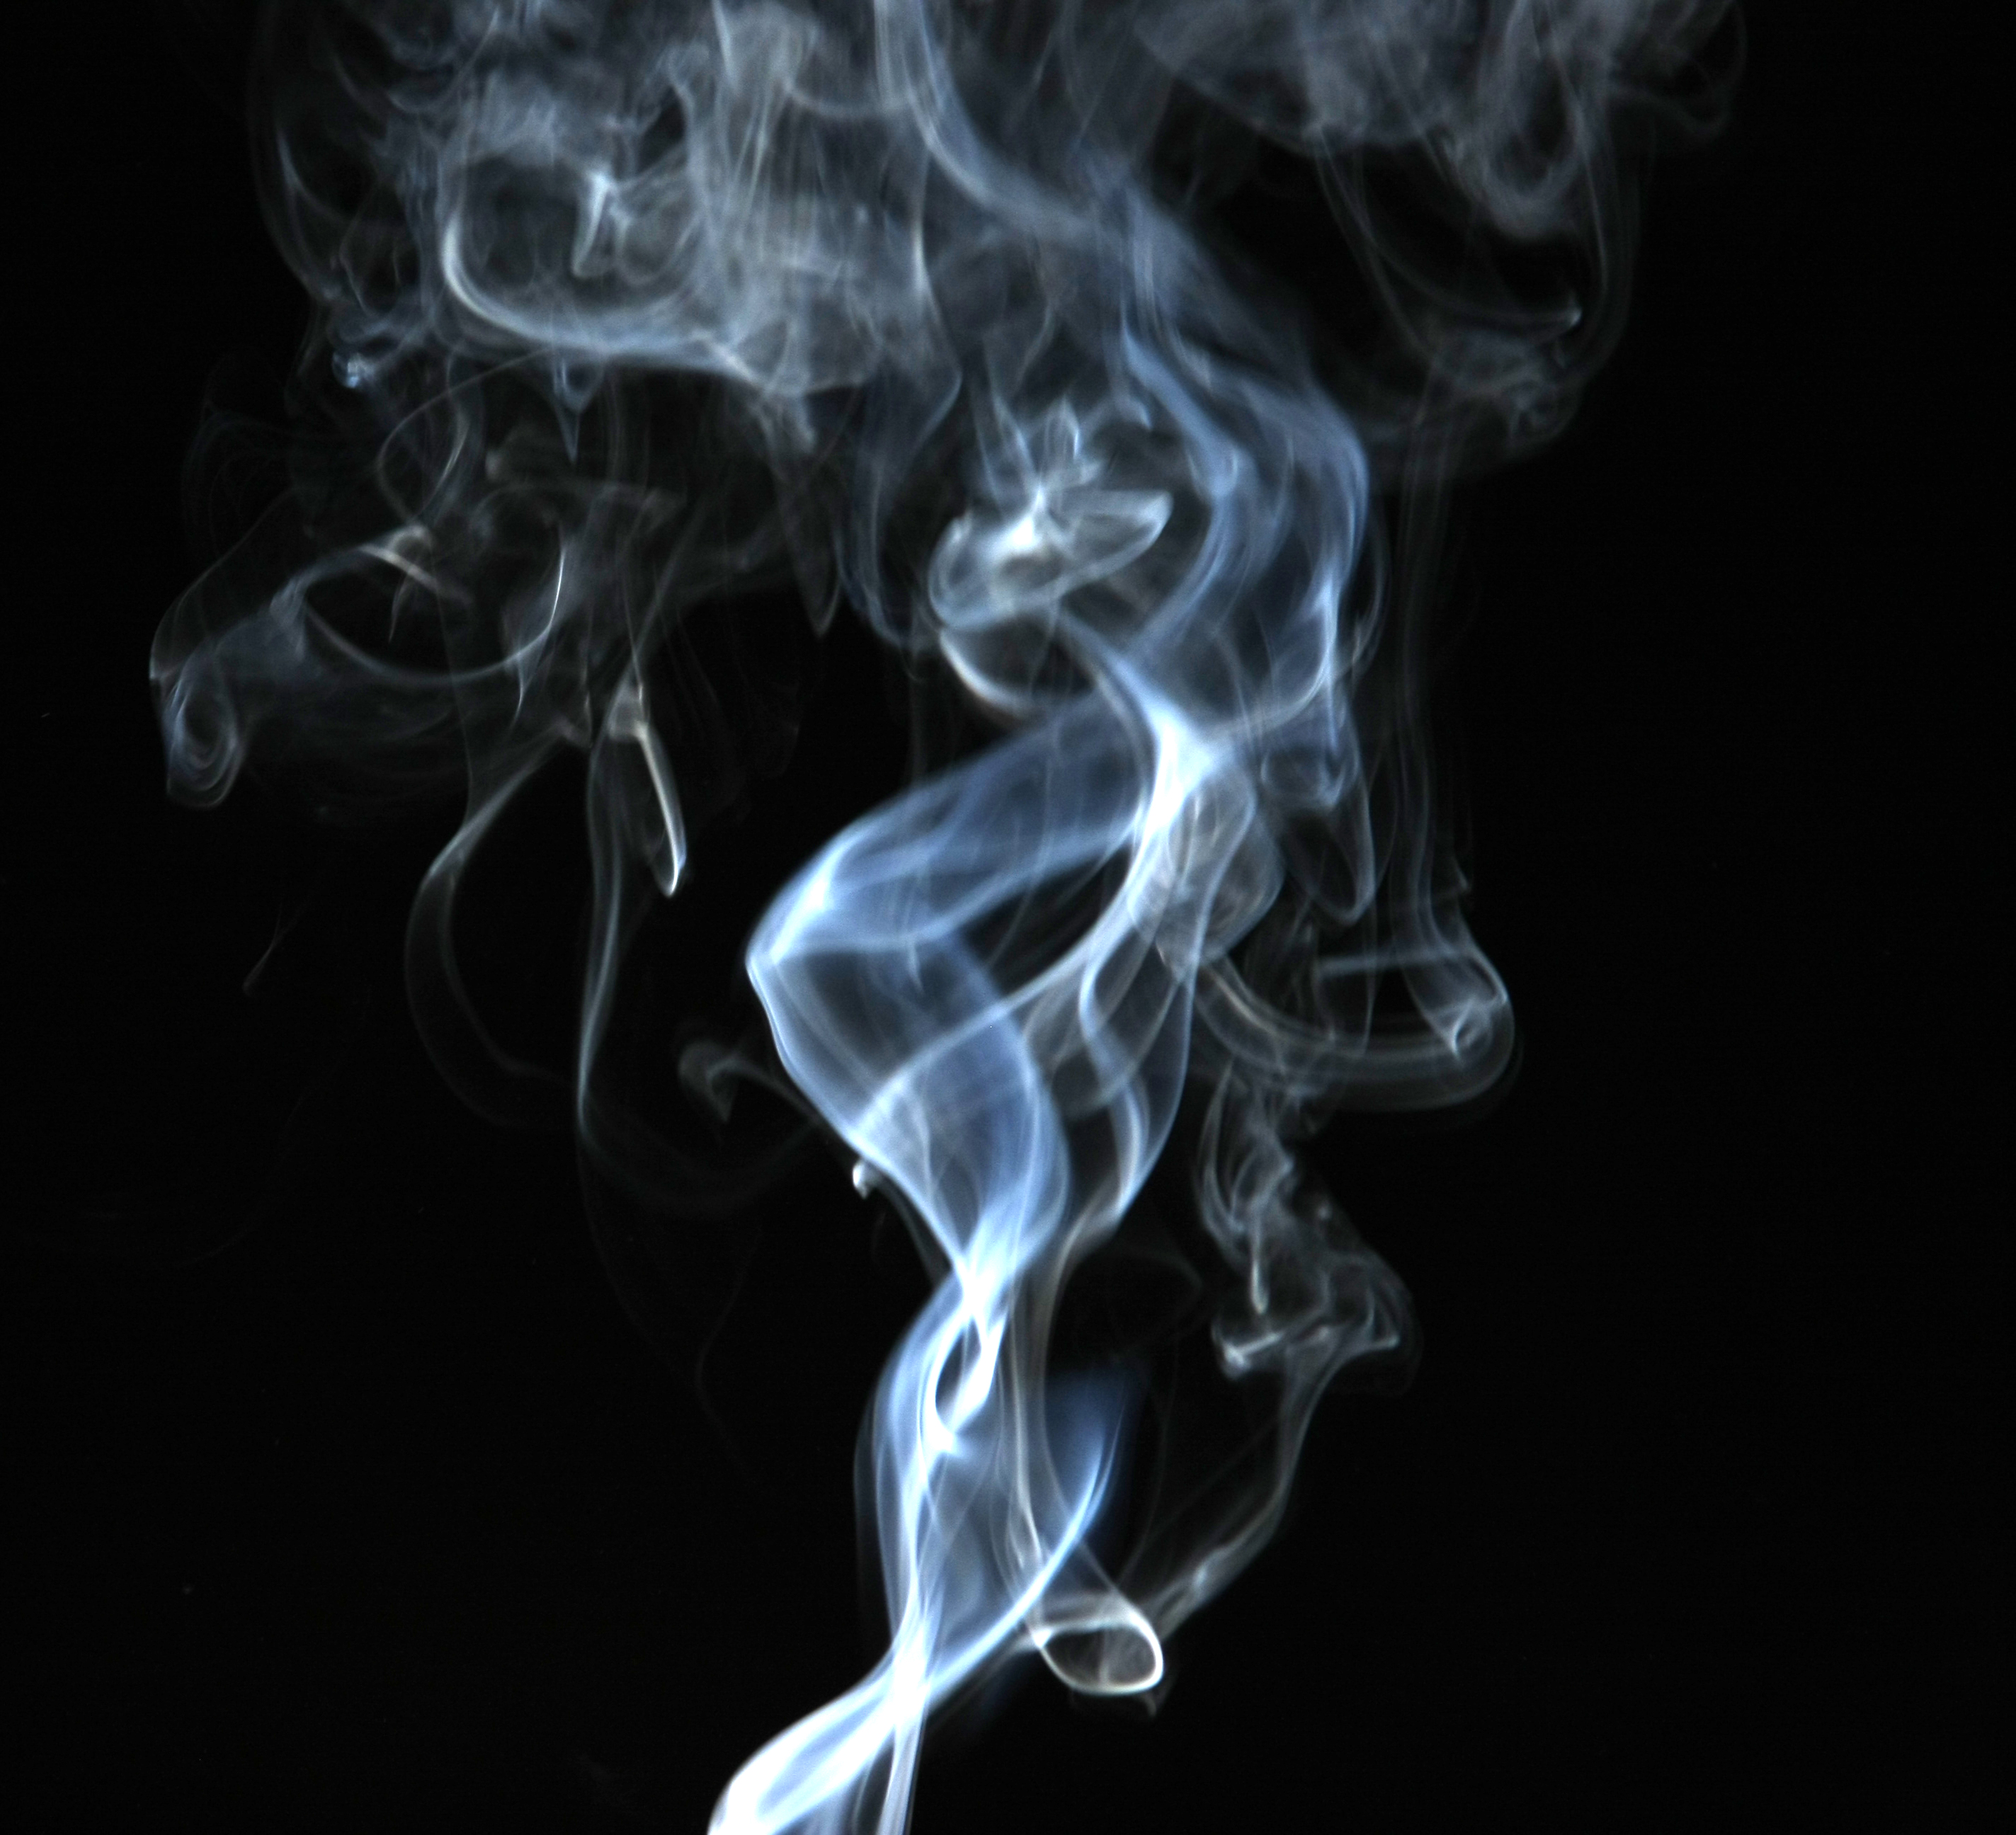 Smoking clipart hot smoke V Smoke Image Images V